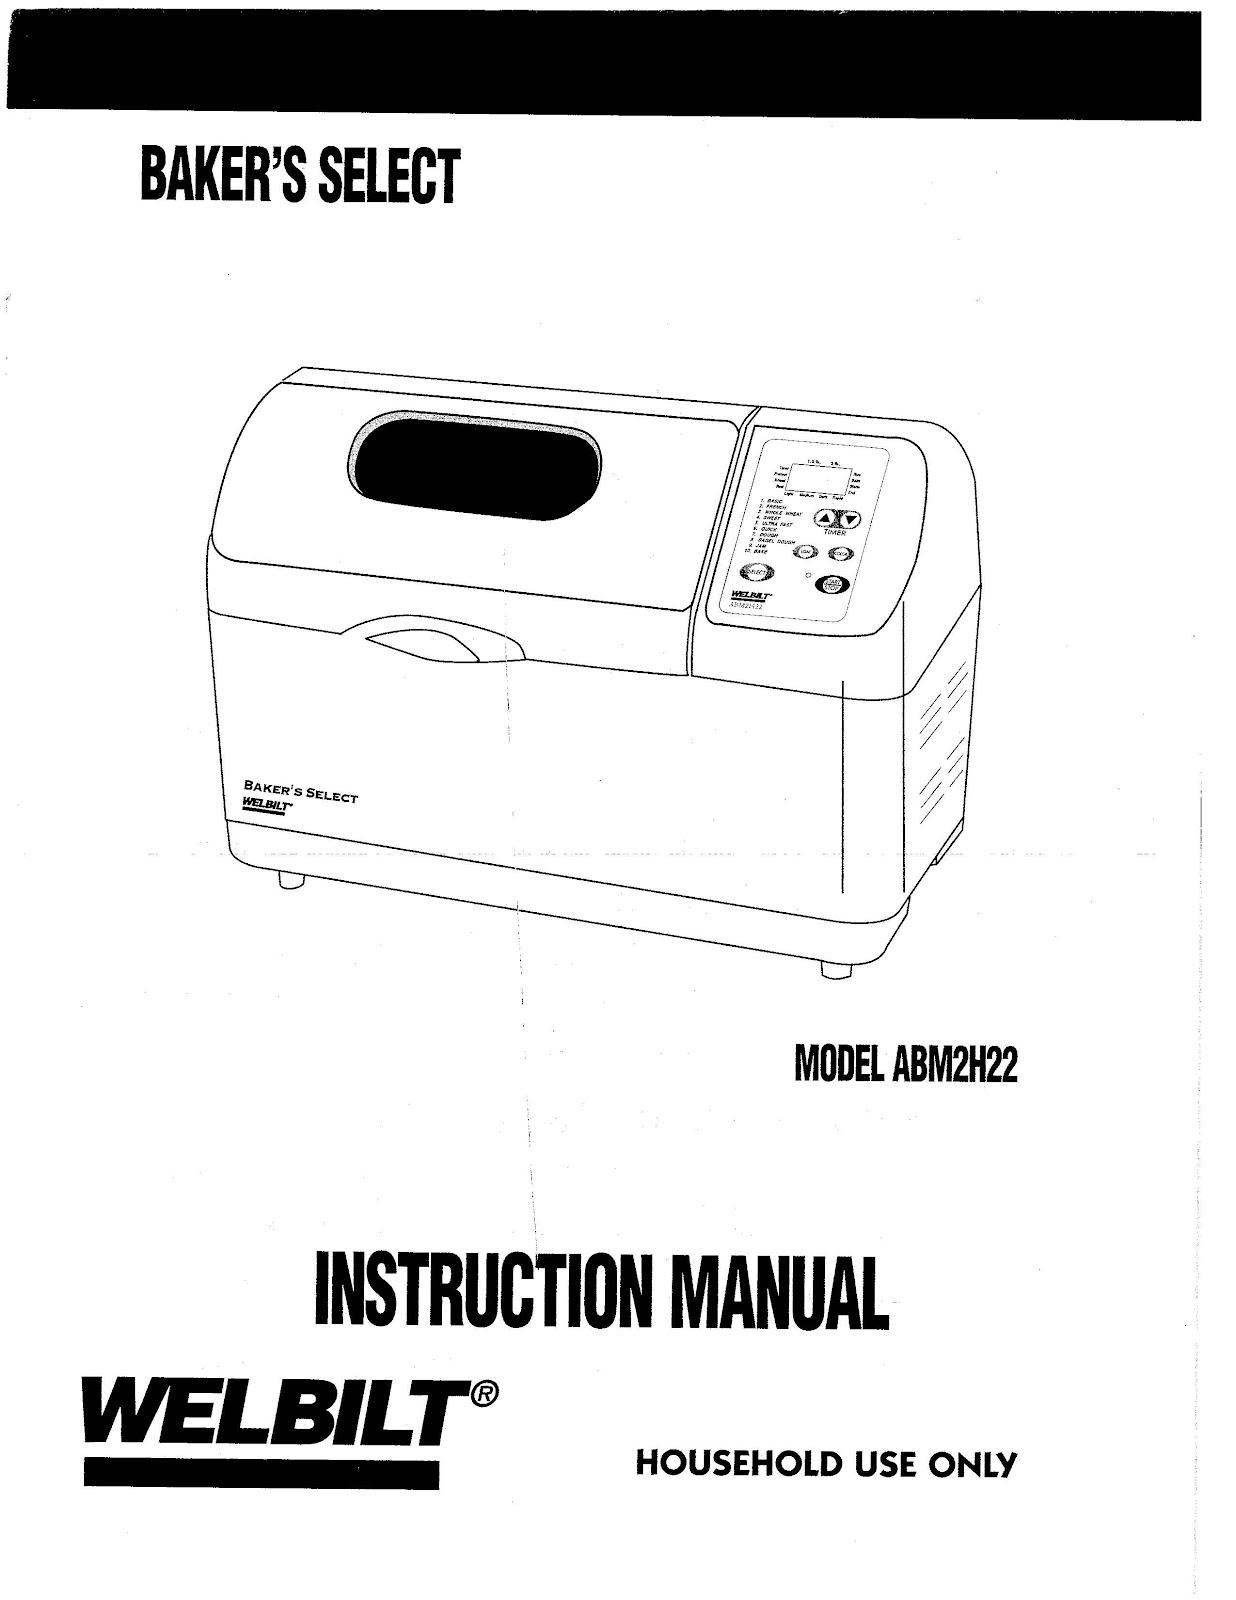 welbilt bread machine blog model abm2h22 welbilt bread machine rh welbiltbreadmachine blogspot com  welbilt bread machine abm2h60 recipes